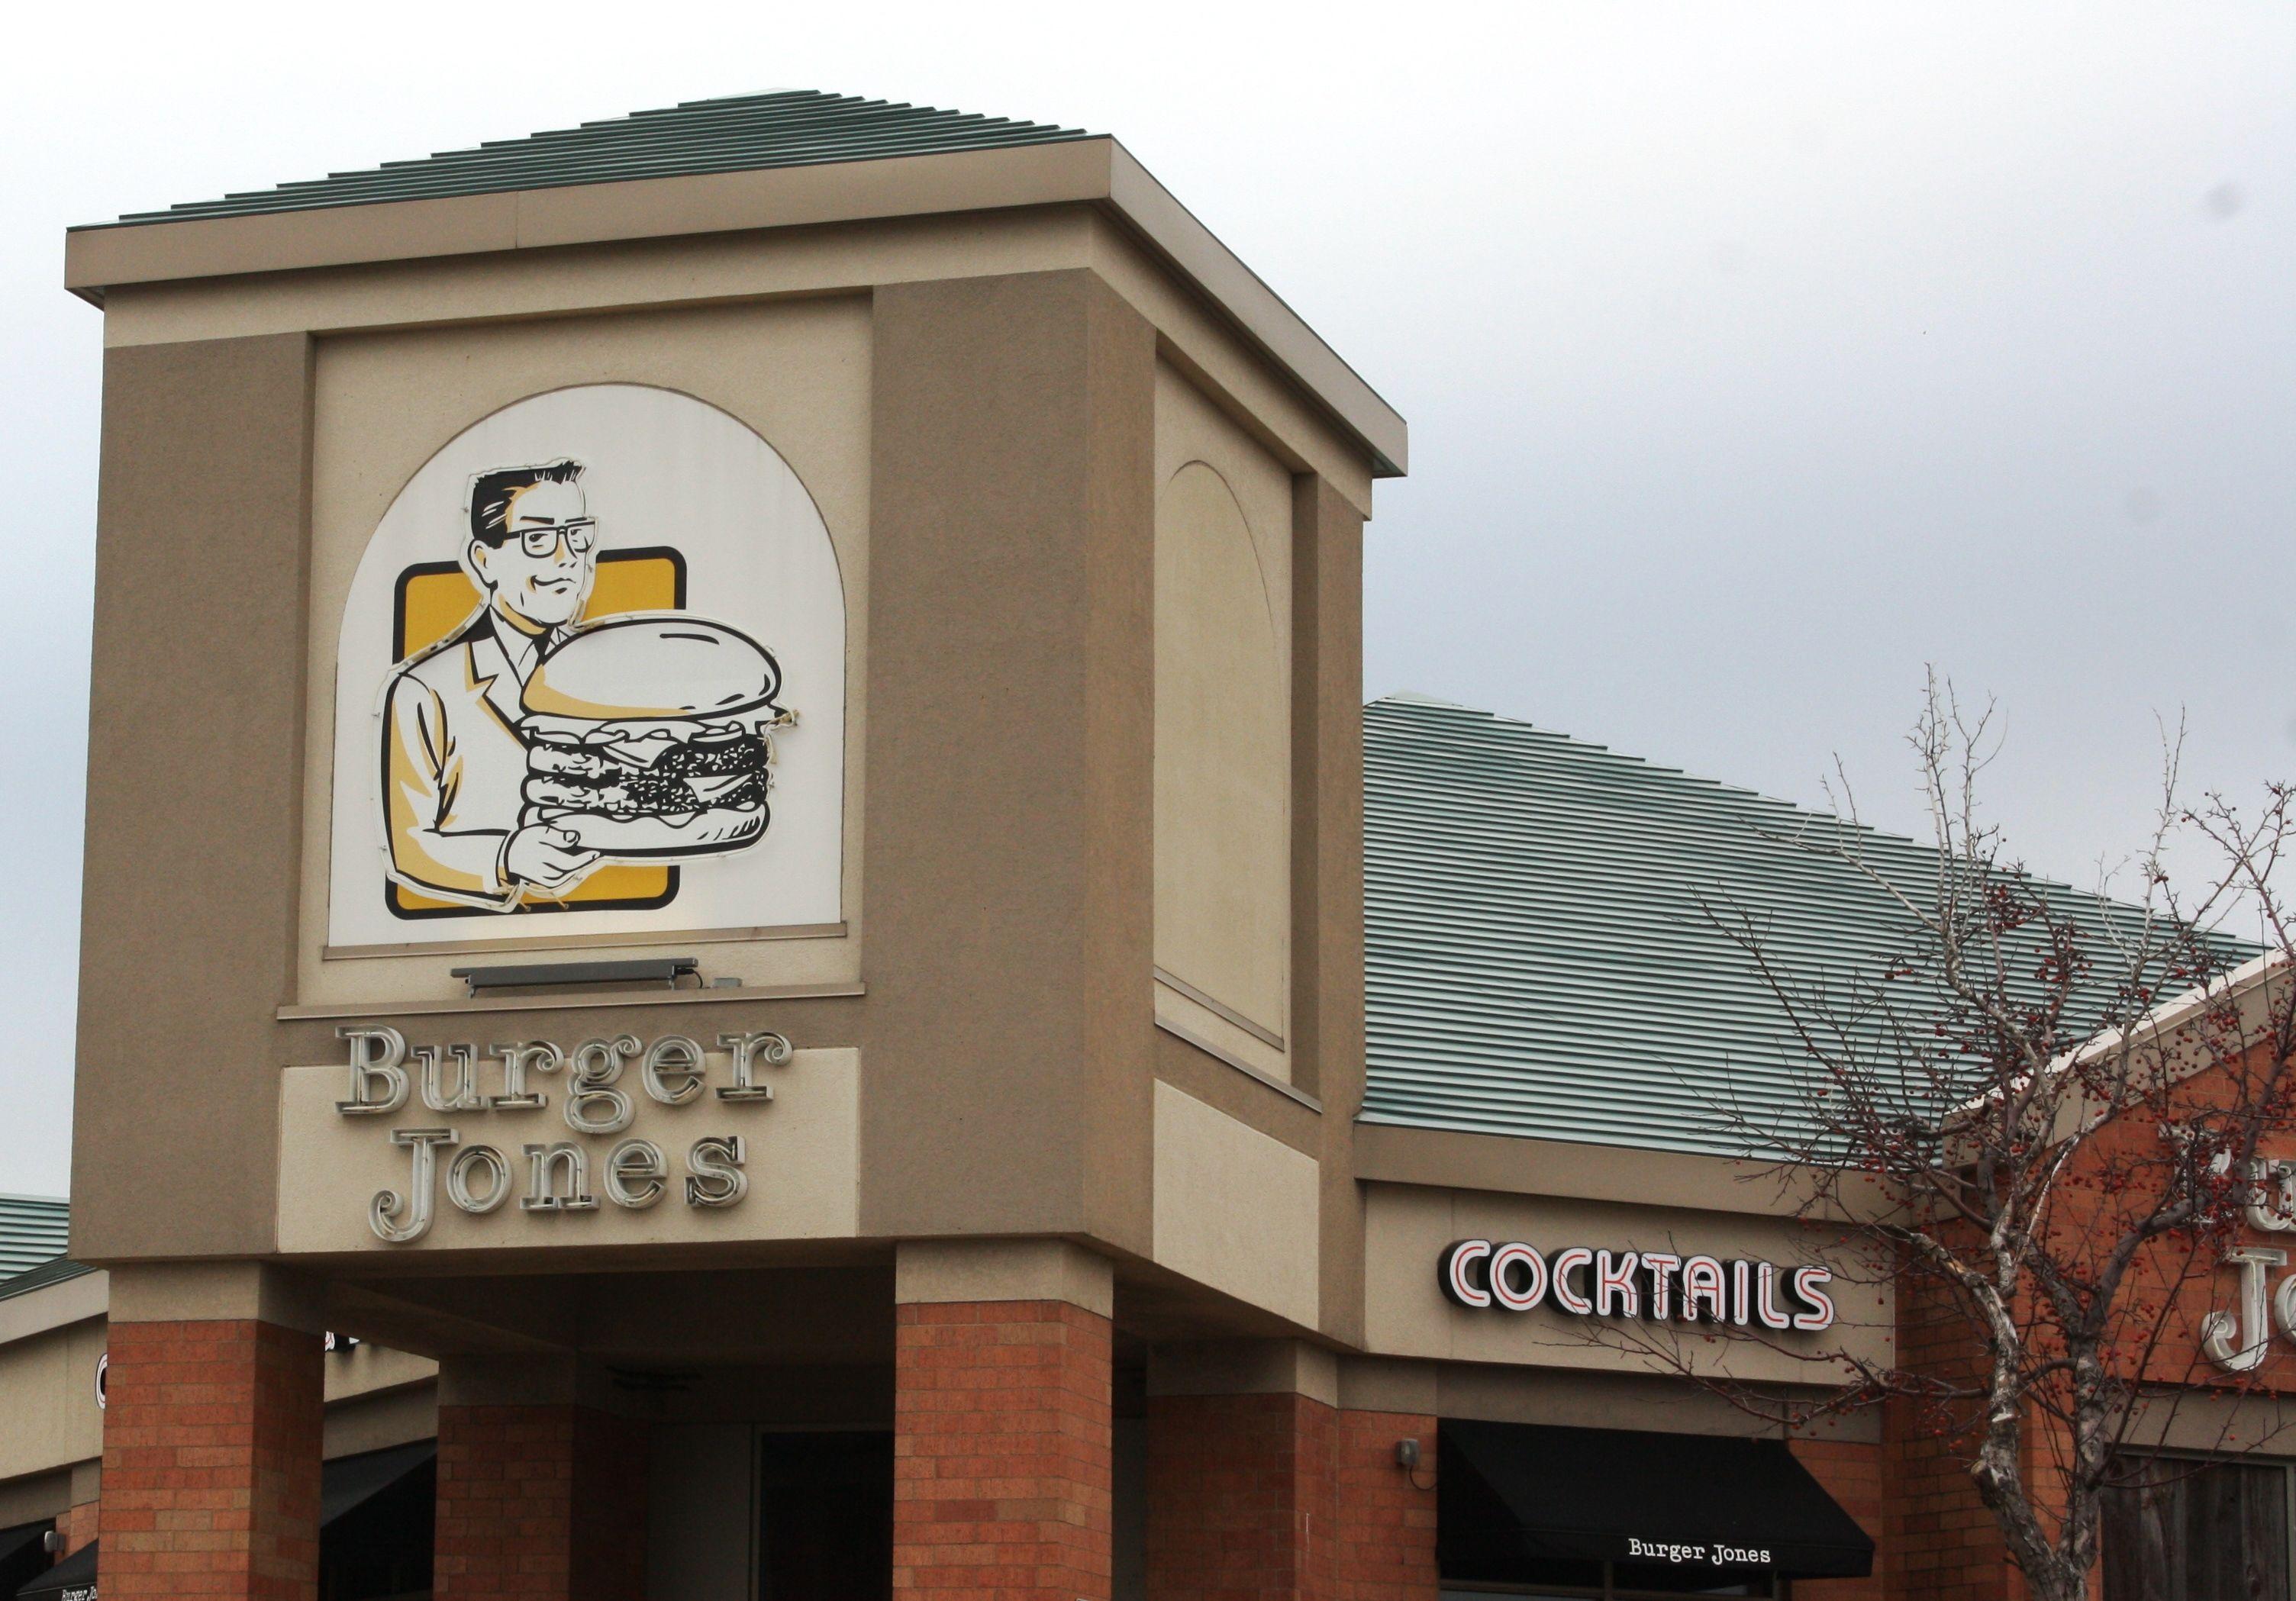 Burger jones at 1619 county rd 42 w burnsville mn 55306